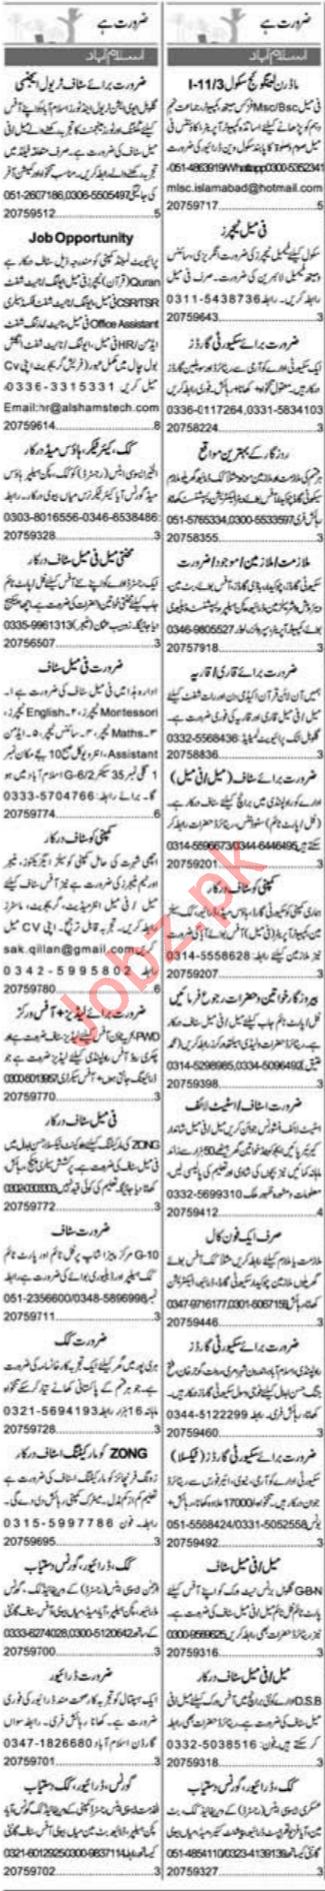 Express Sunday Islamabad Classified Ads 9th Feb 2020